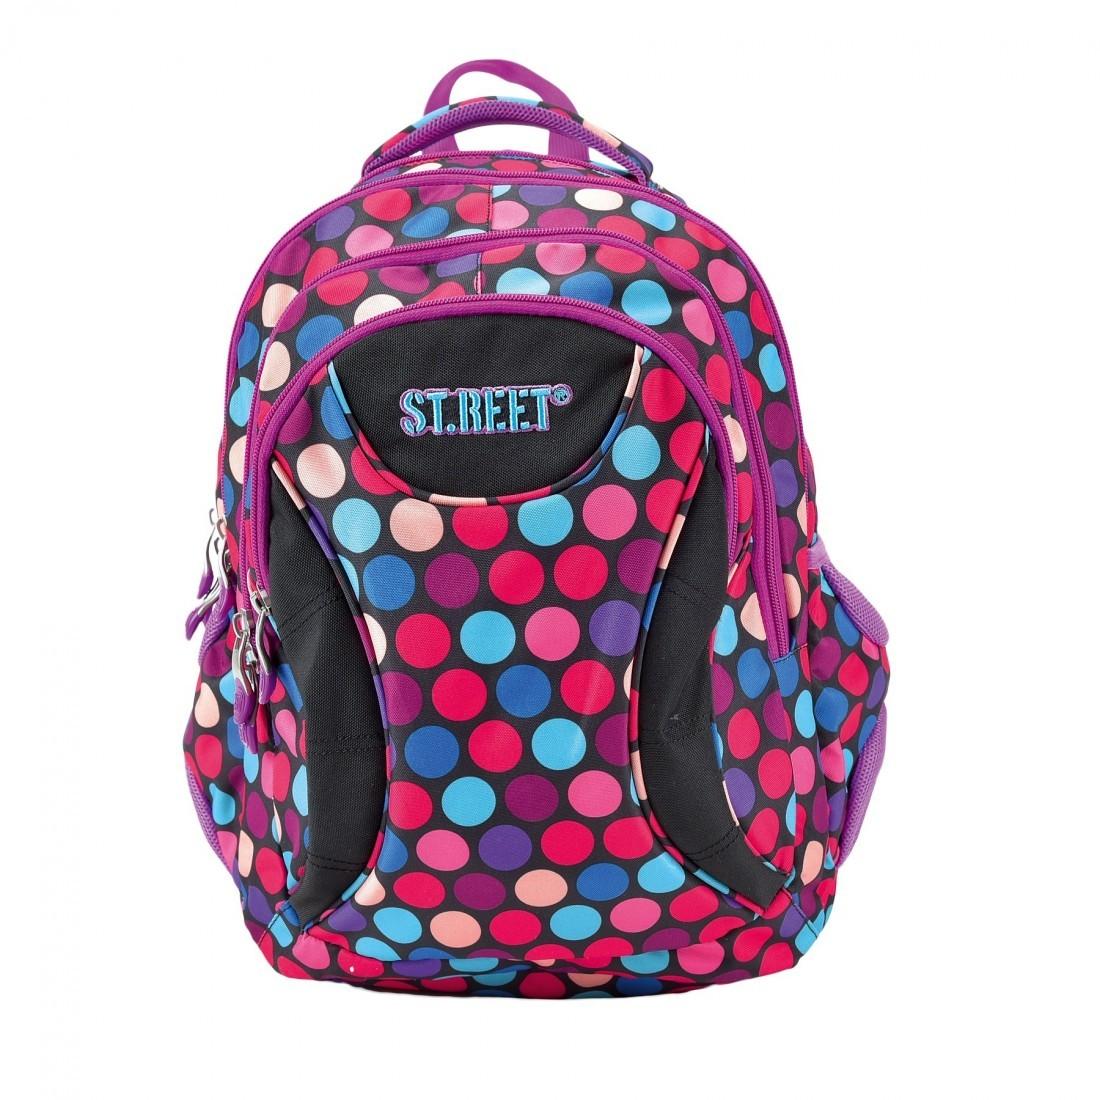 d5800b40e17b7 Plecak młodzieżowy 02 ST.REET czarny w kolorowe kropki DOTS 1 PURPLE&PINK